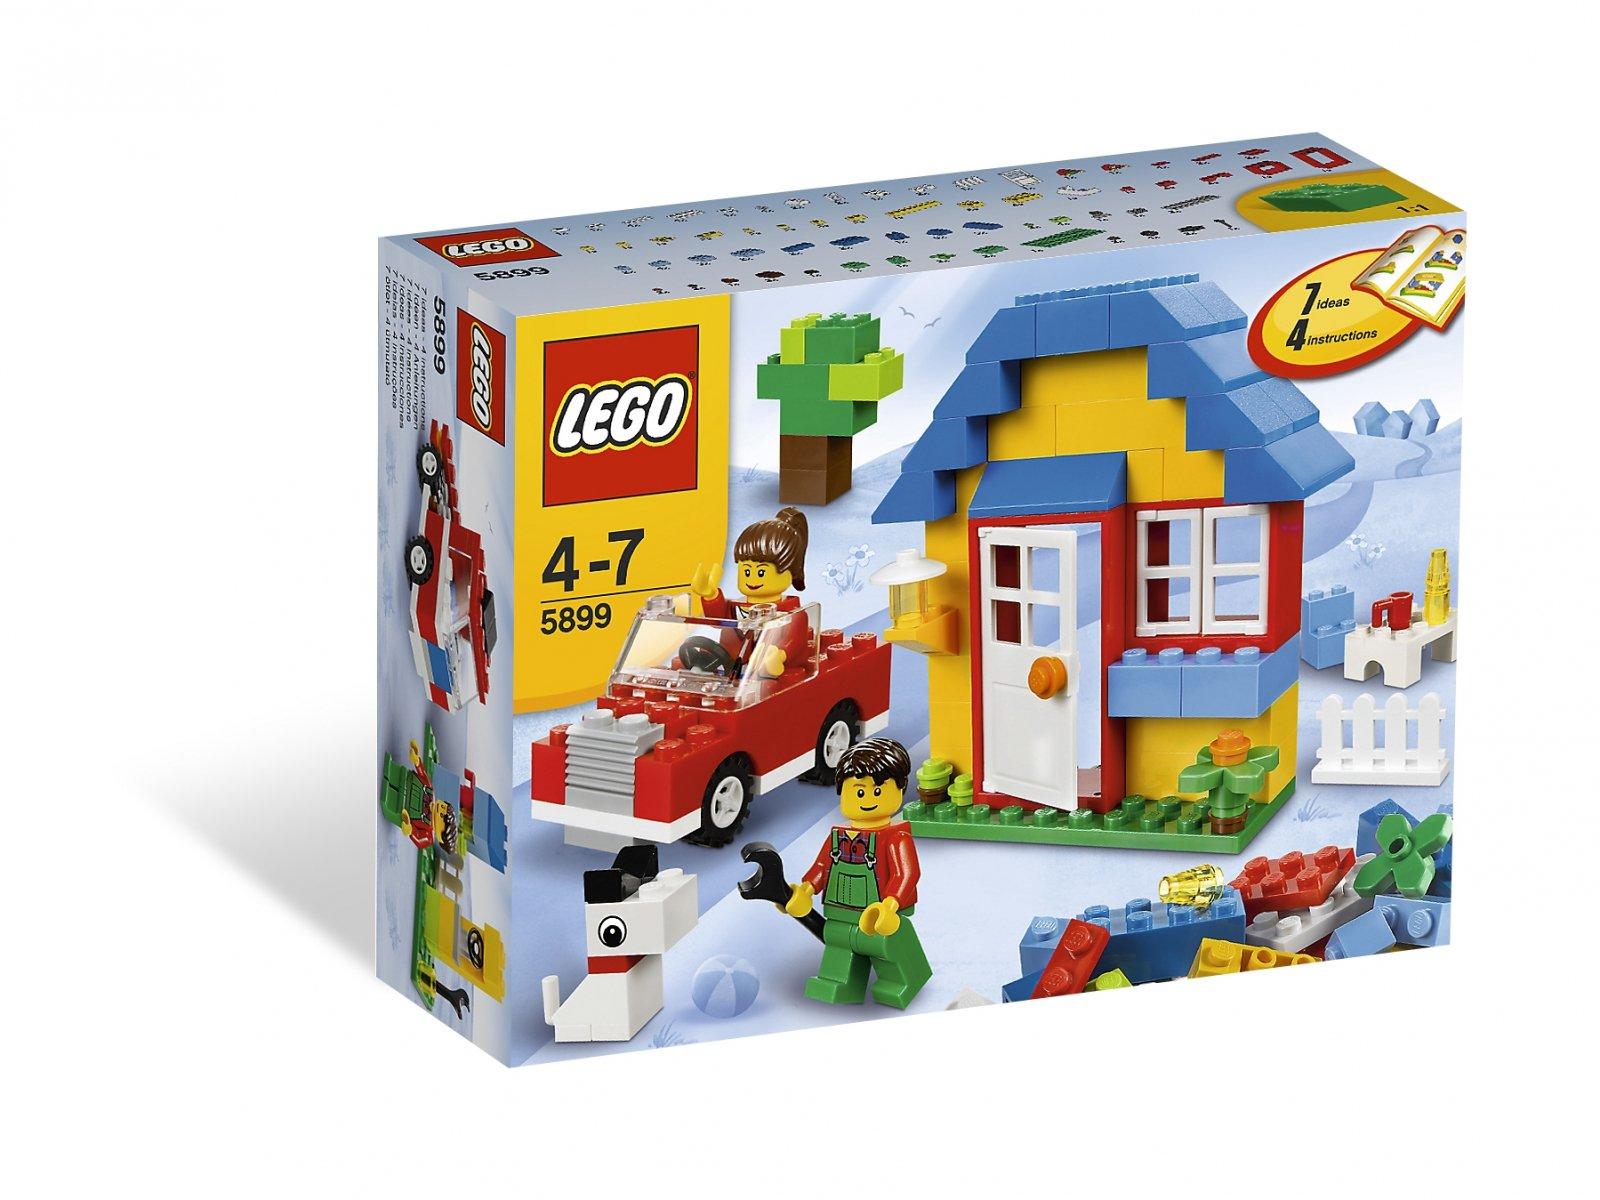 LEGO 5899 Bricks & More Zestaw do budowy domu